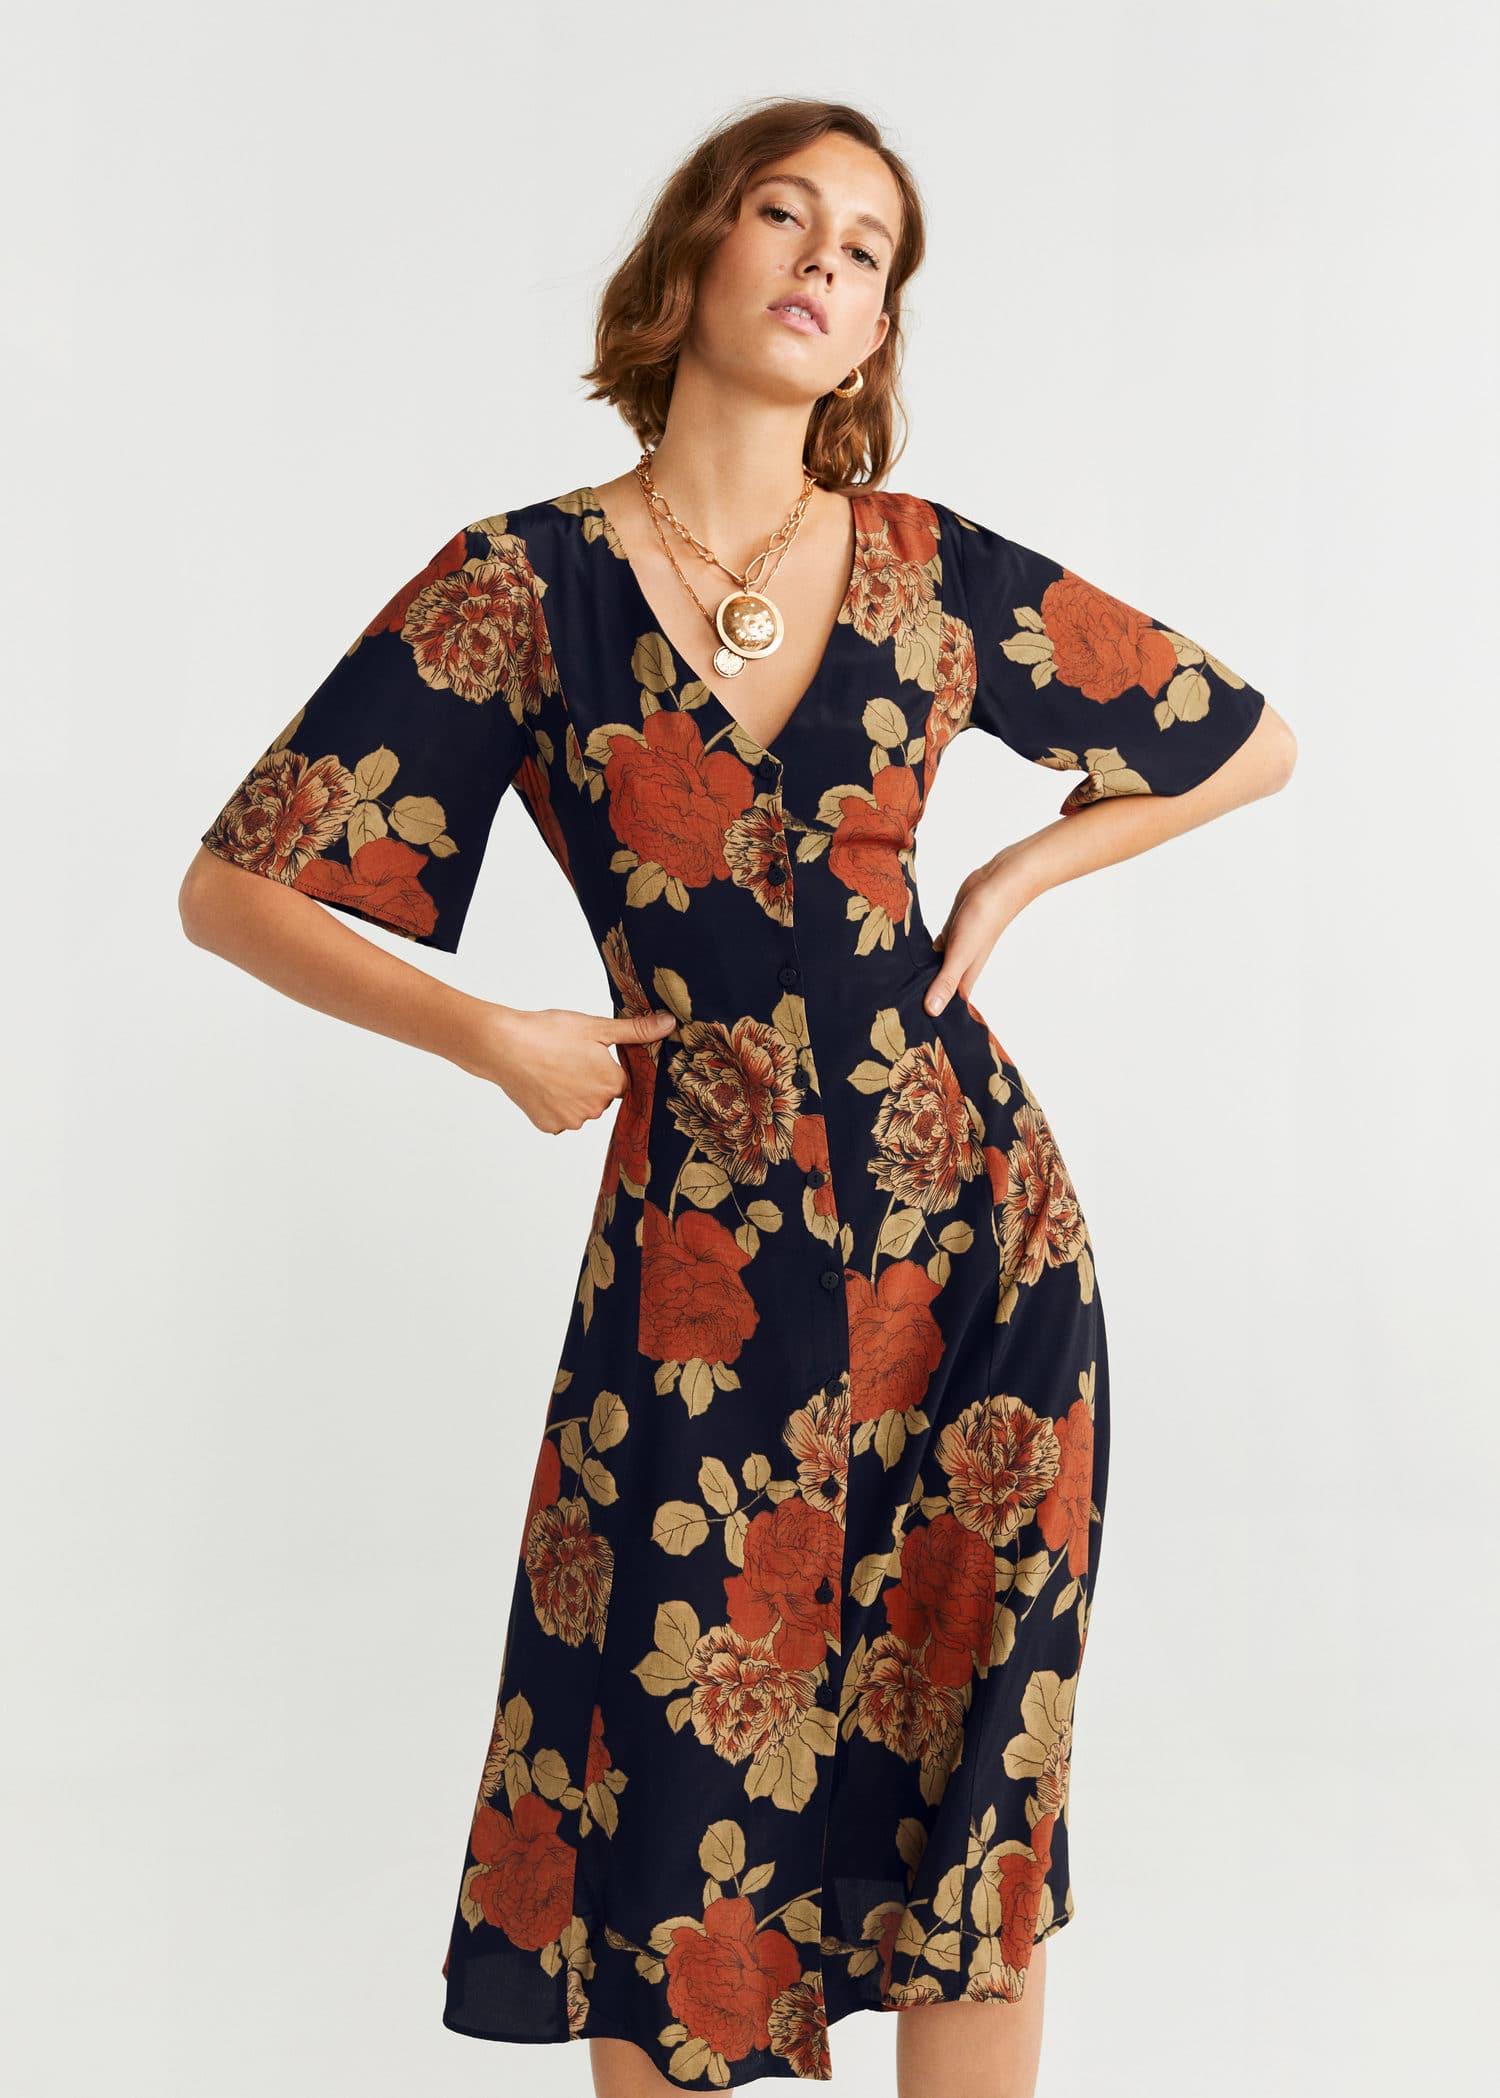 Midi floral dress Woman | MNG Australia